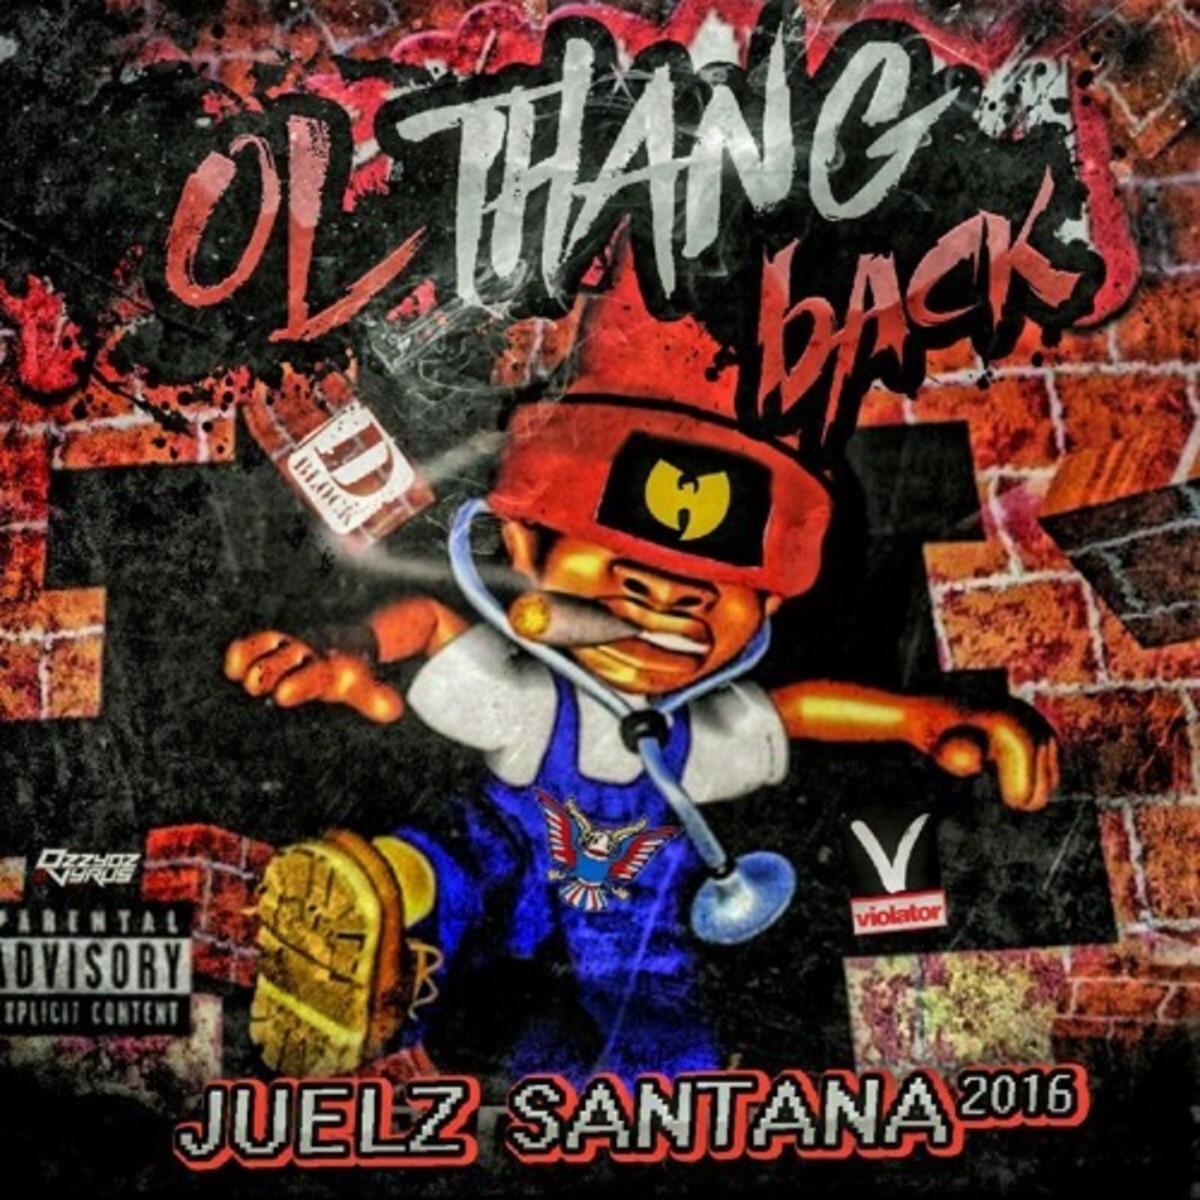 juelz-santana-ol-thang-back.jpg